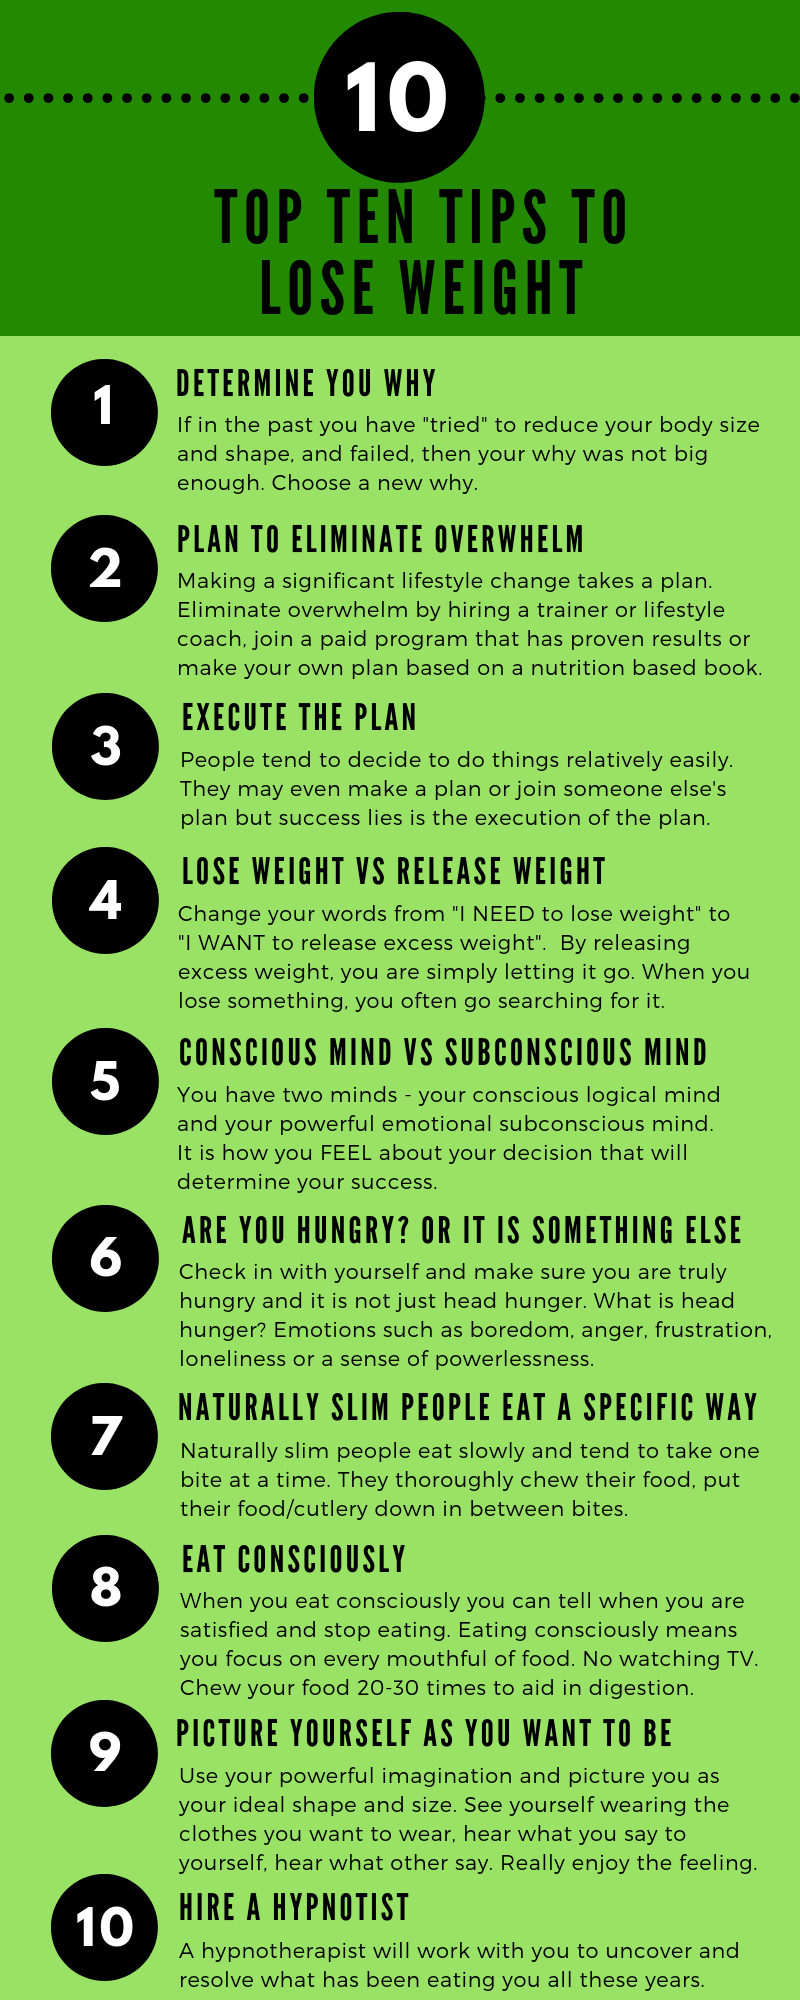 flourish_Hypnosis_weight_loss_tips